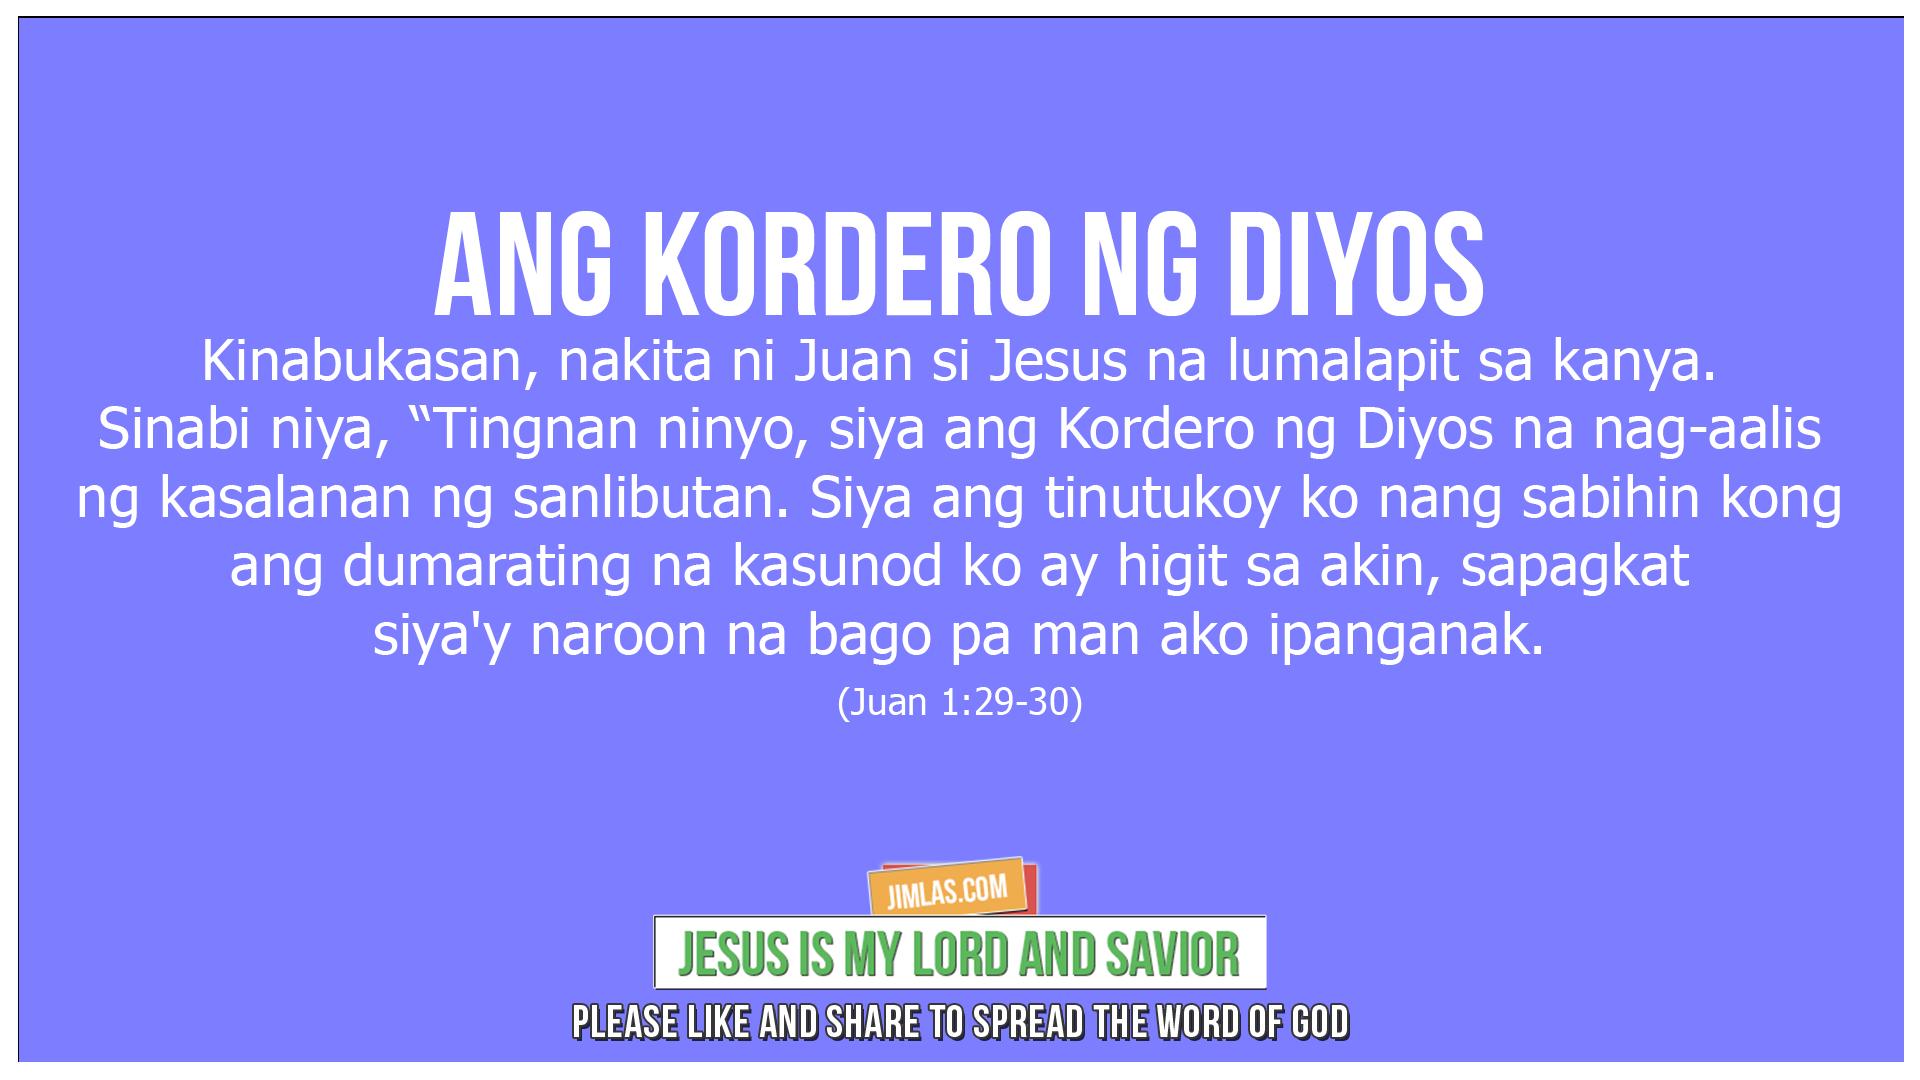 Juan 1 29-30, Juan 1:29-30